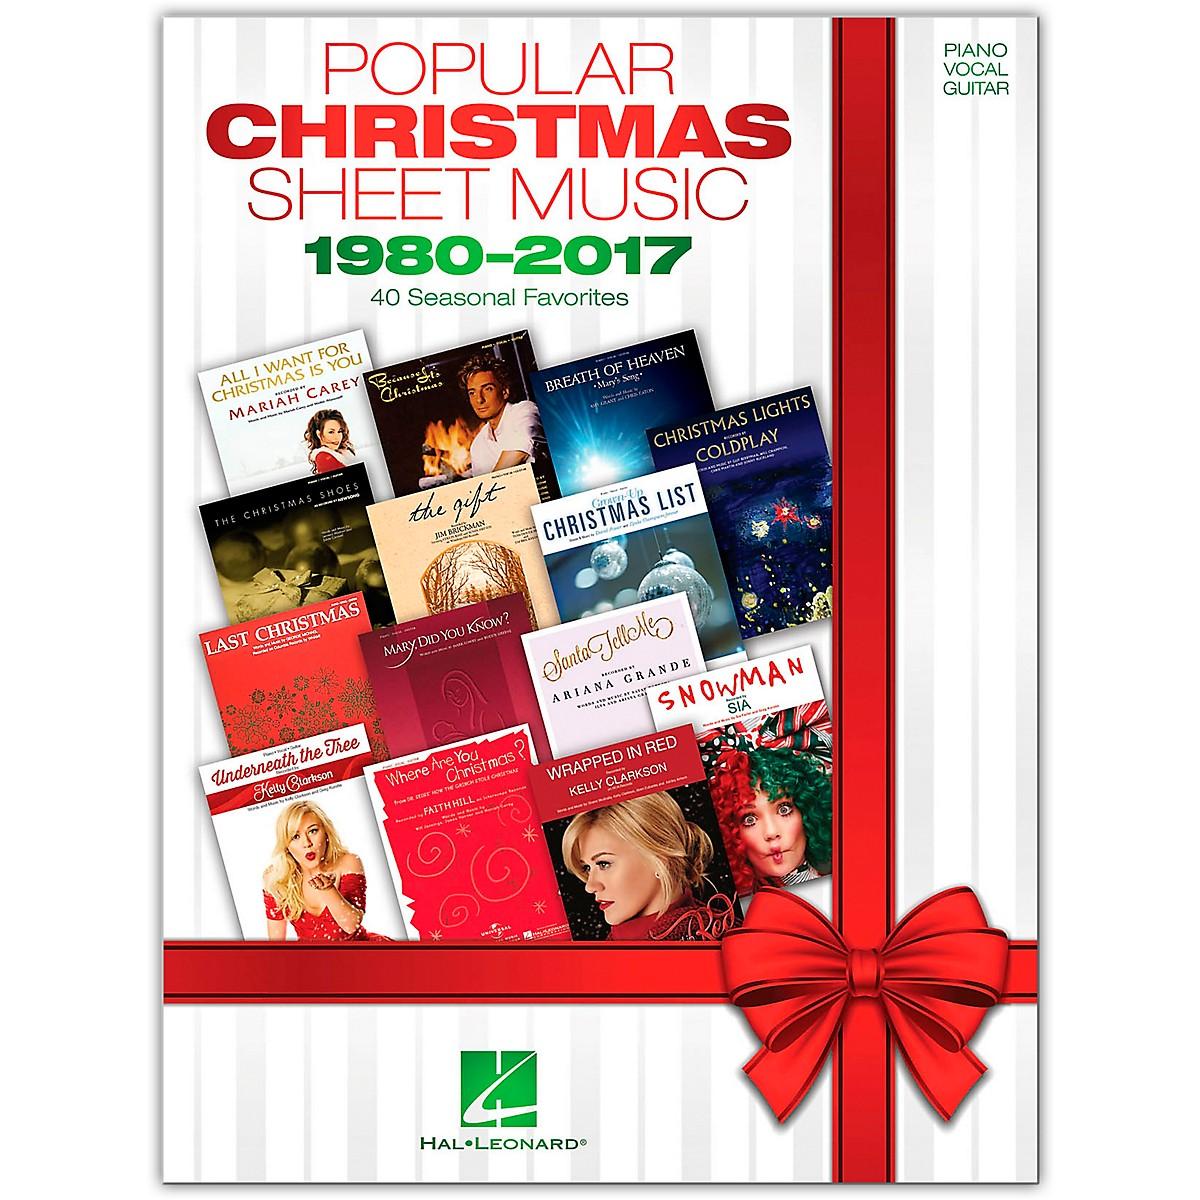 Hal Leonard Popular Christmas Sheet Music - 1980-2017 Piano/Vocal/Guitar Songbook